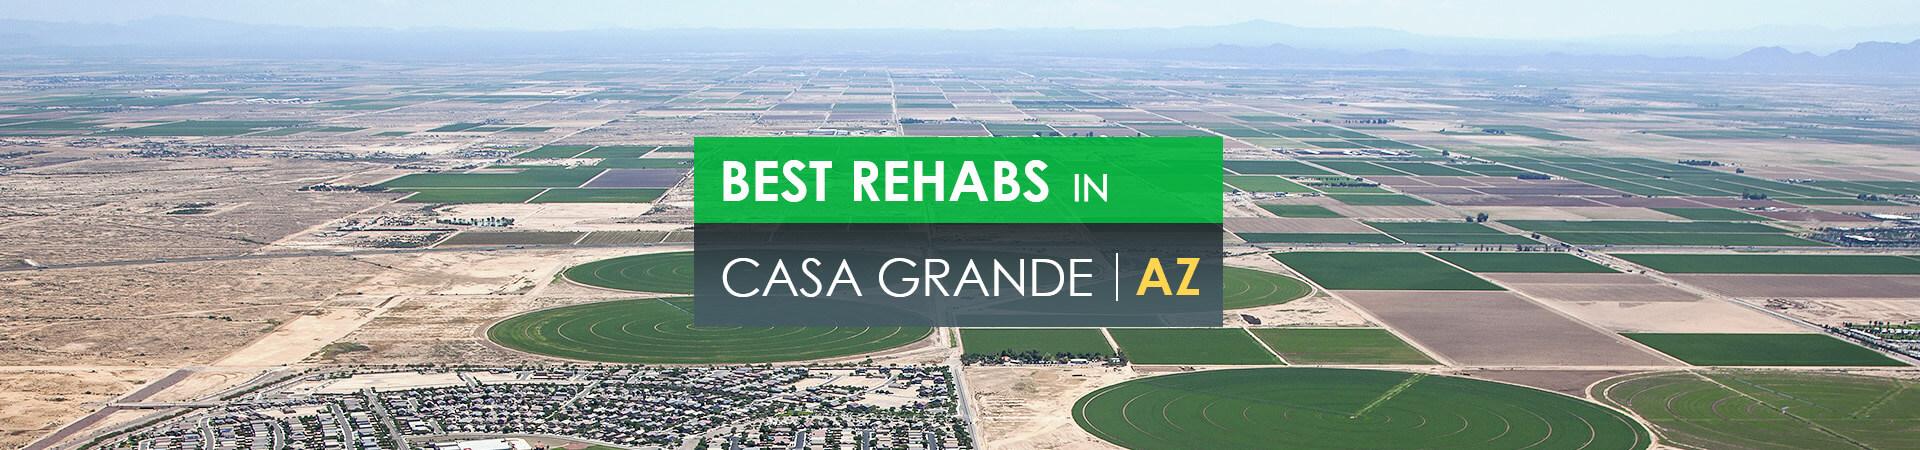 Best rehabs in Casa Grande, AZ